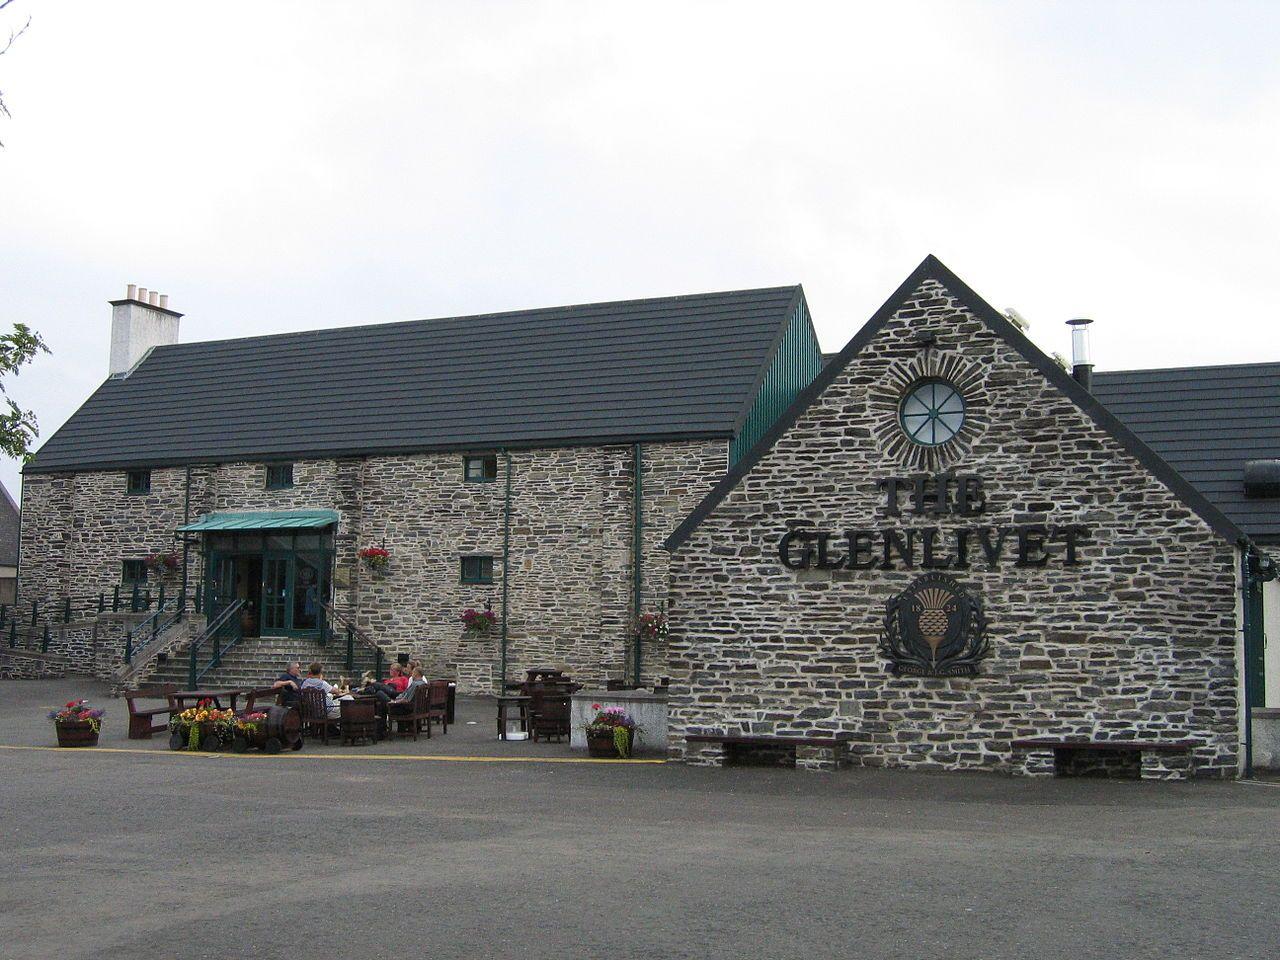 'The Glenlivet' - the single malt whisky that started it all... Speyside, Moray - Scotland